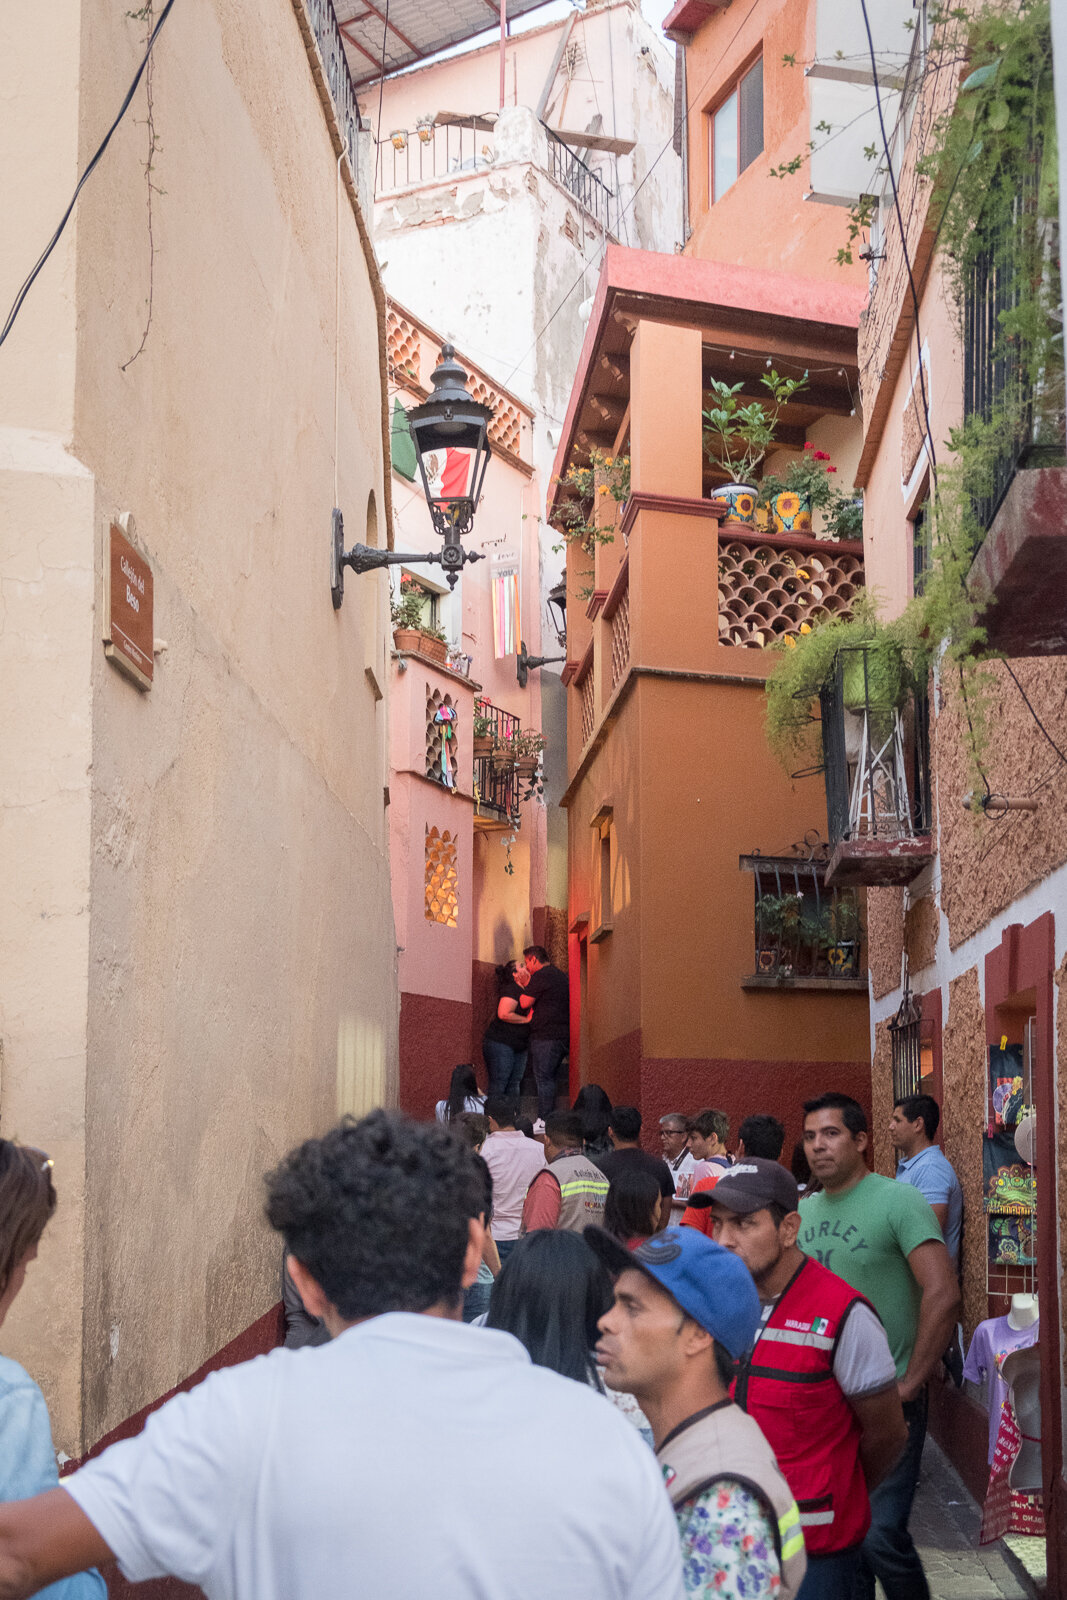 2019.10.8_Mexico_Guanajuato20_Britt first year.jpg